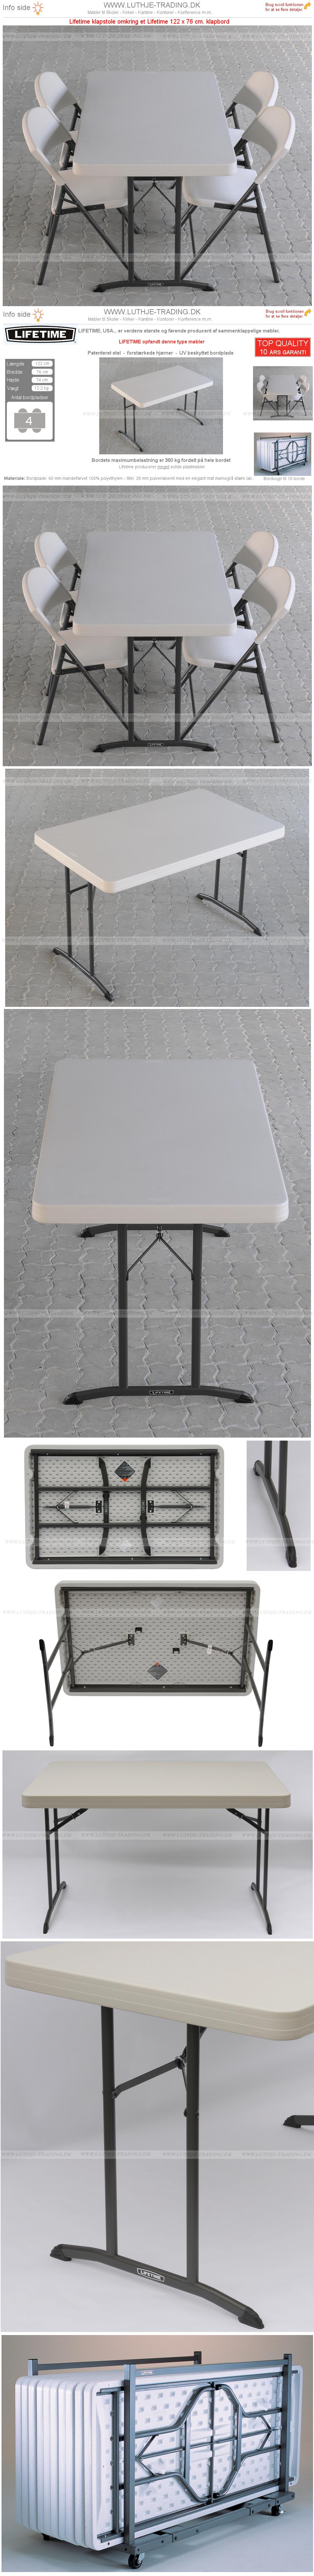 Plast klapborde opstilling 2